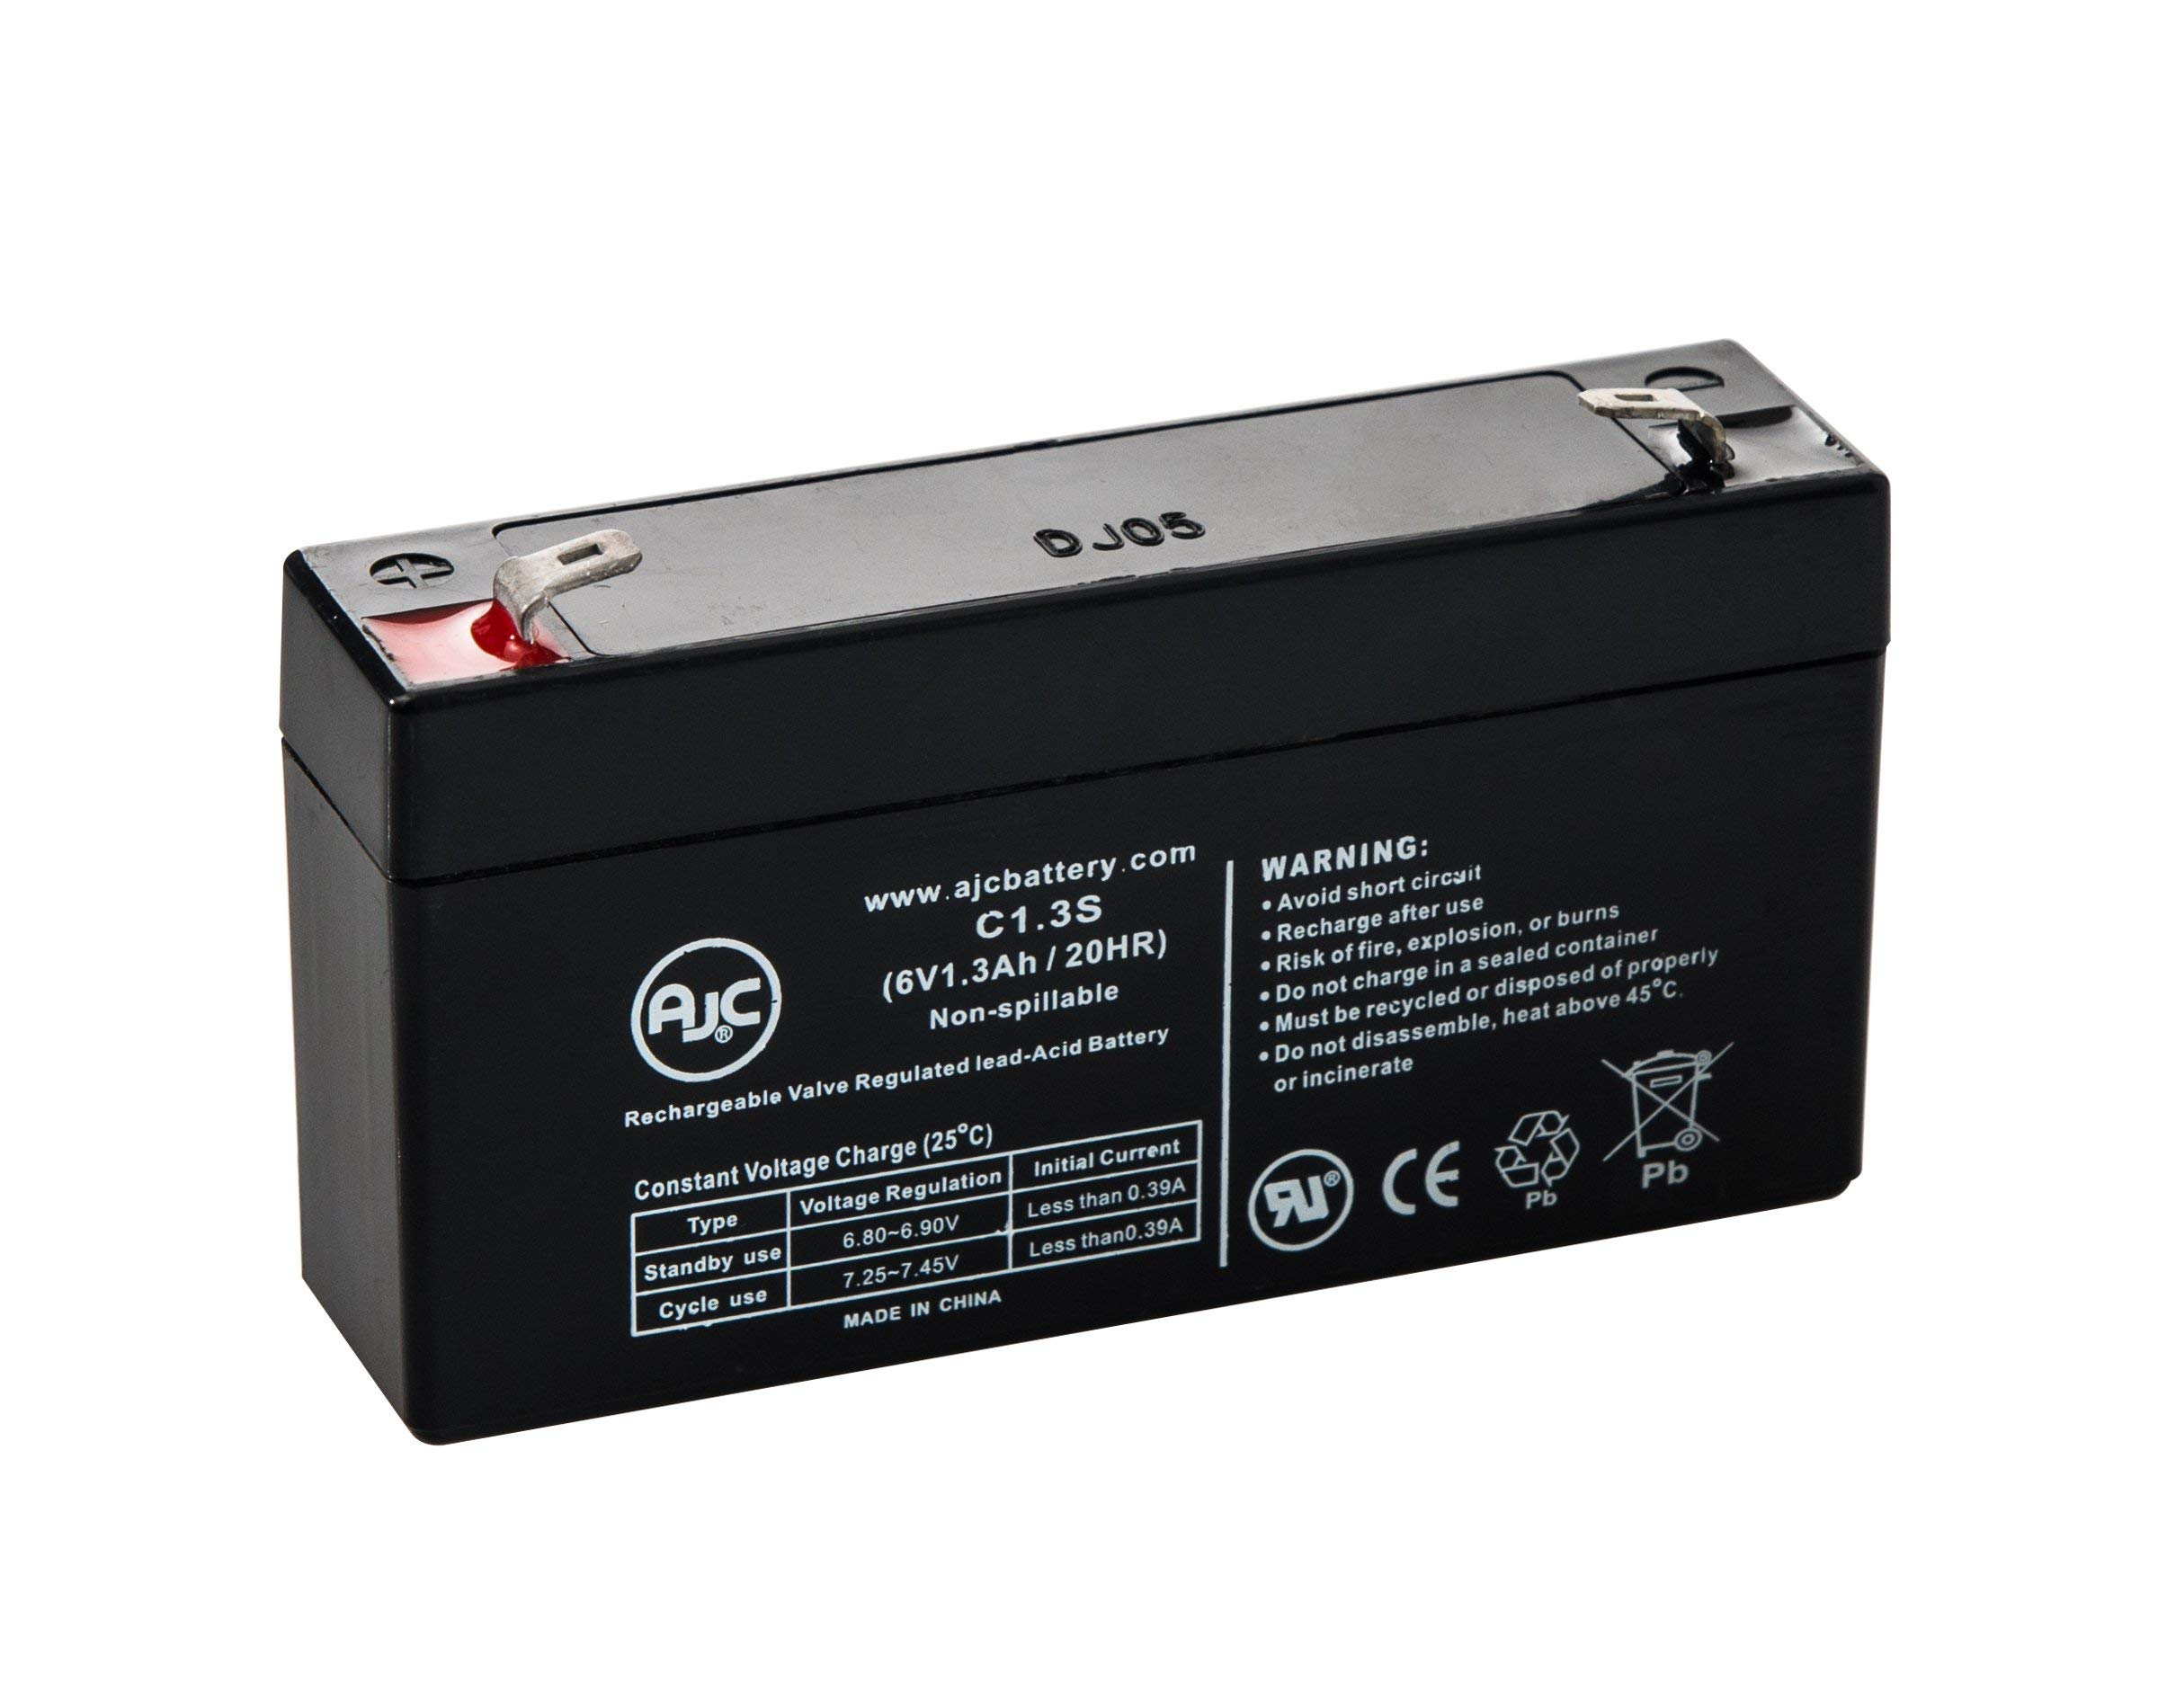 GE Simon XT 6V 1.3Ah Alarm Battery Compatible Replacement